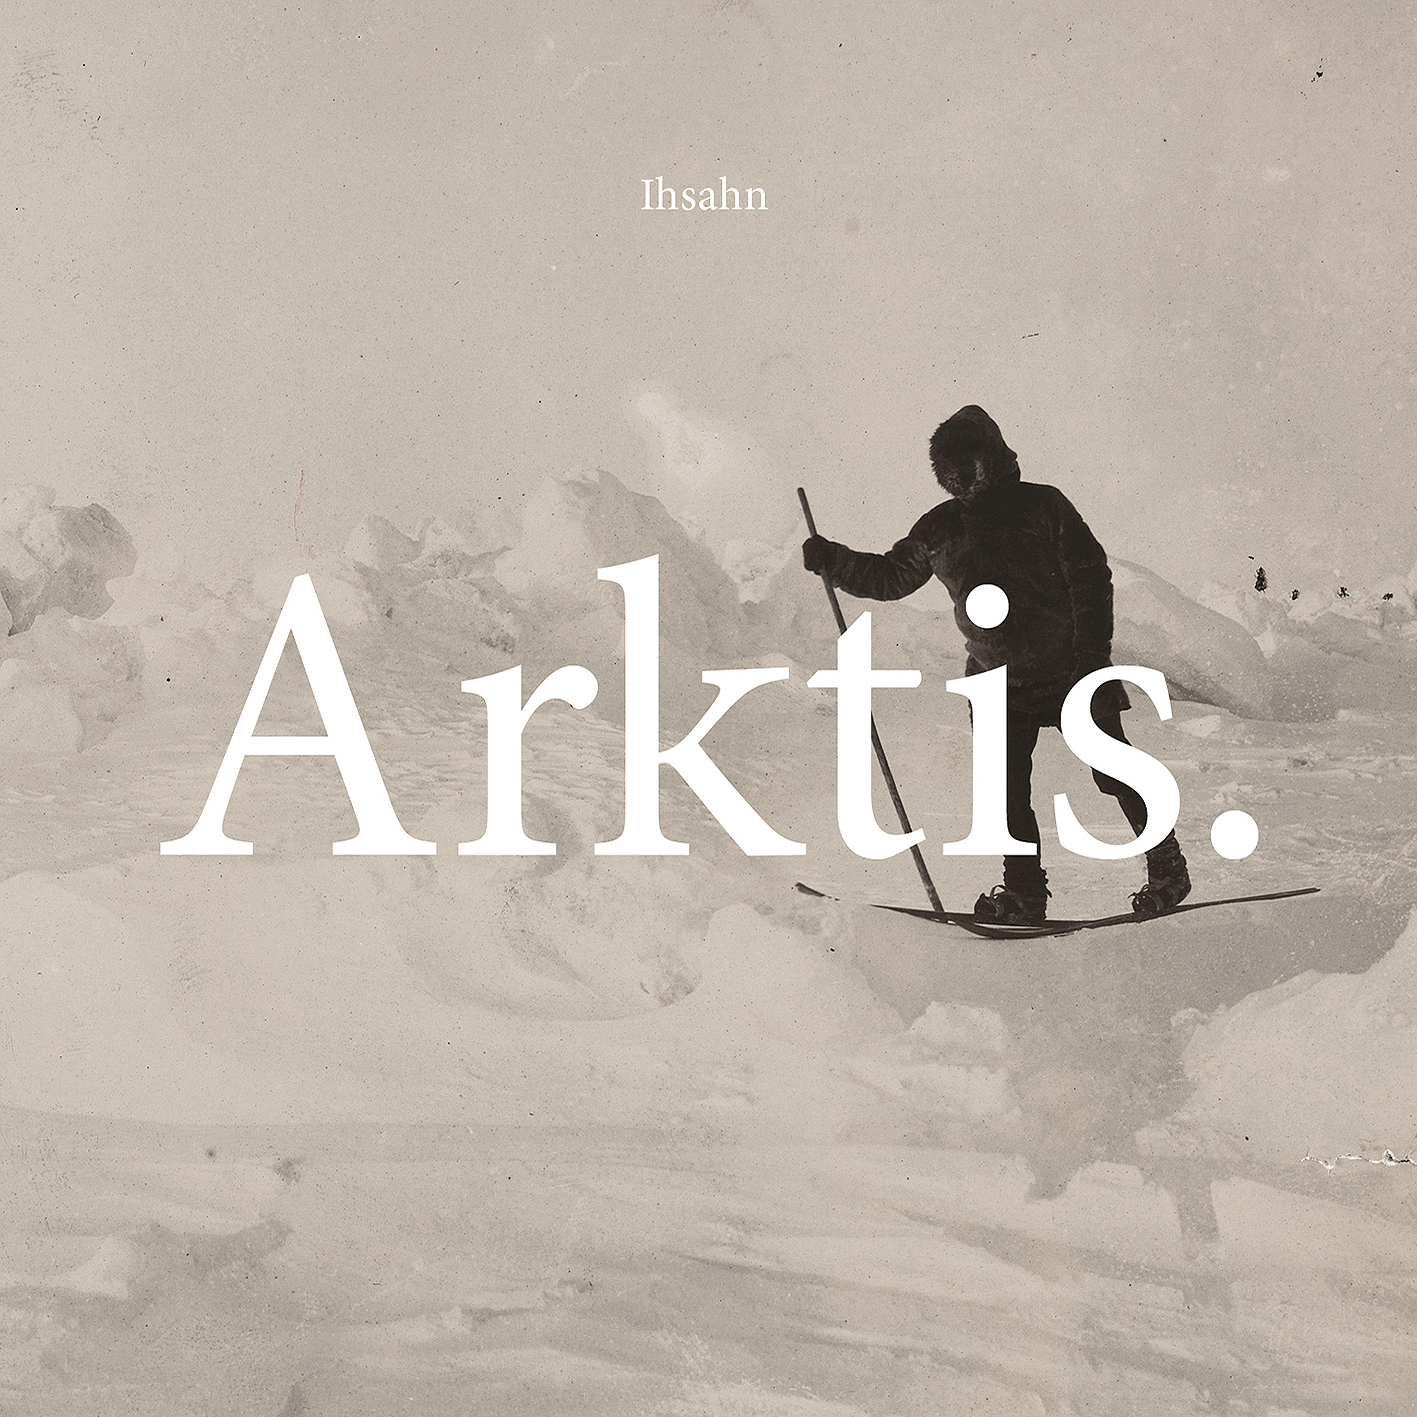 Ihsahn: Arktis